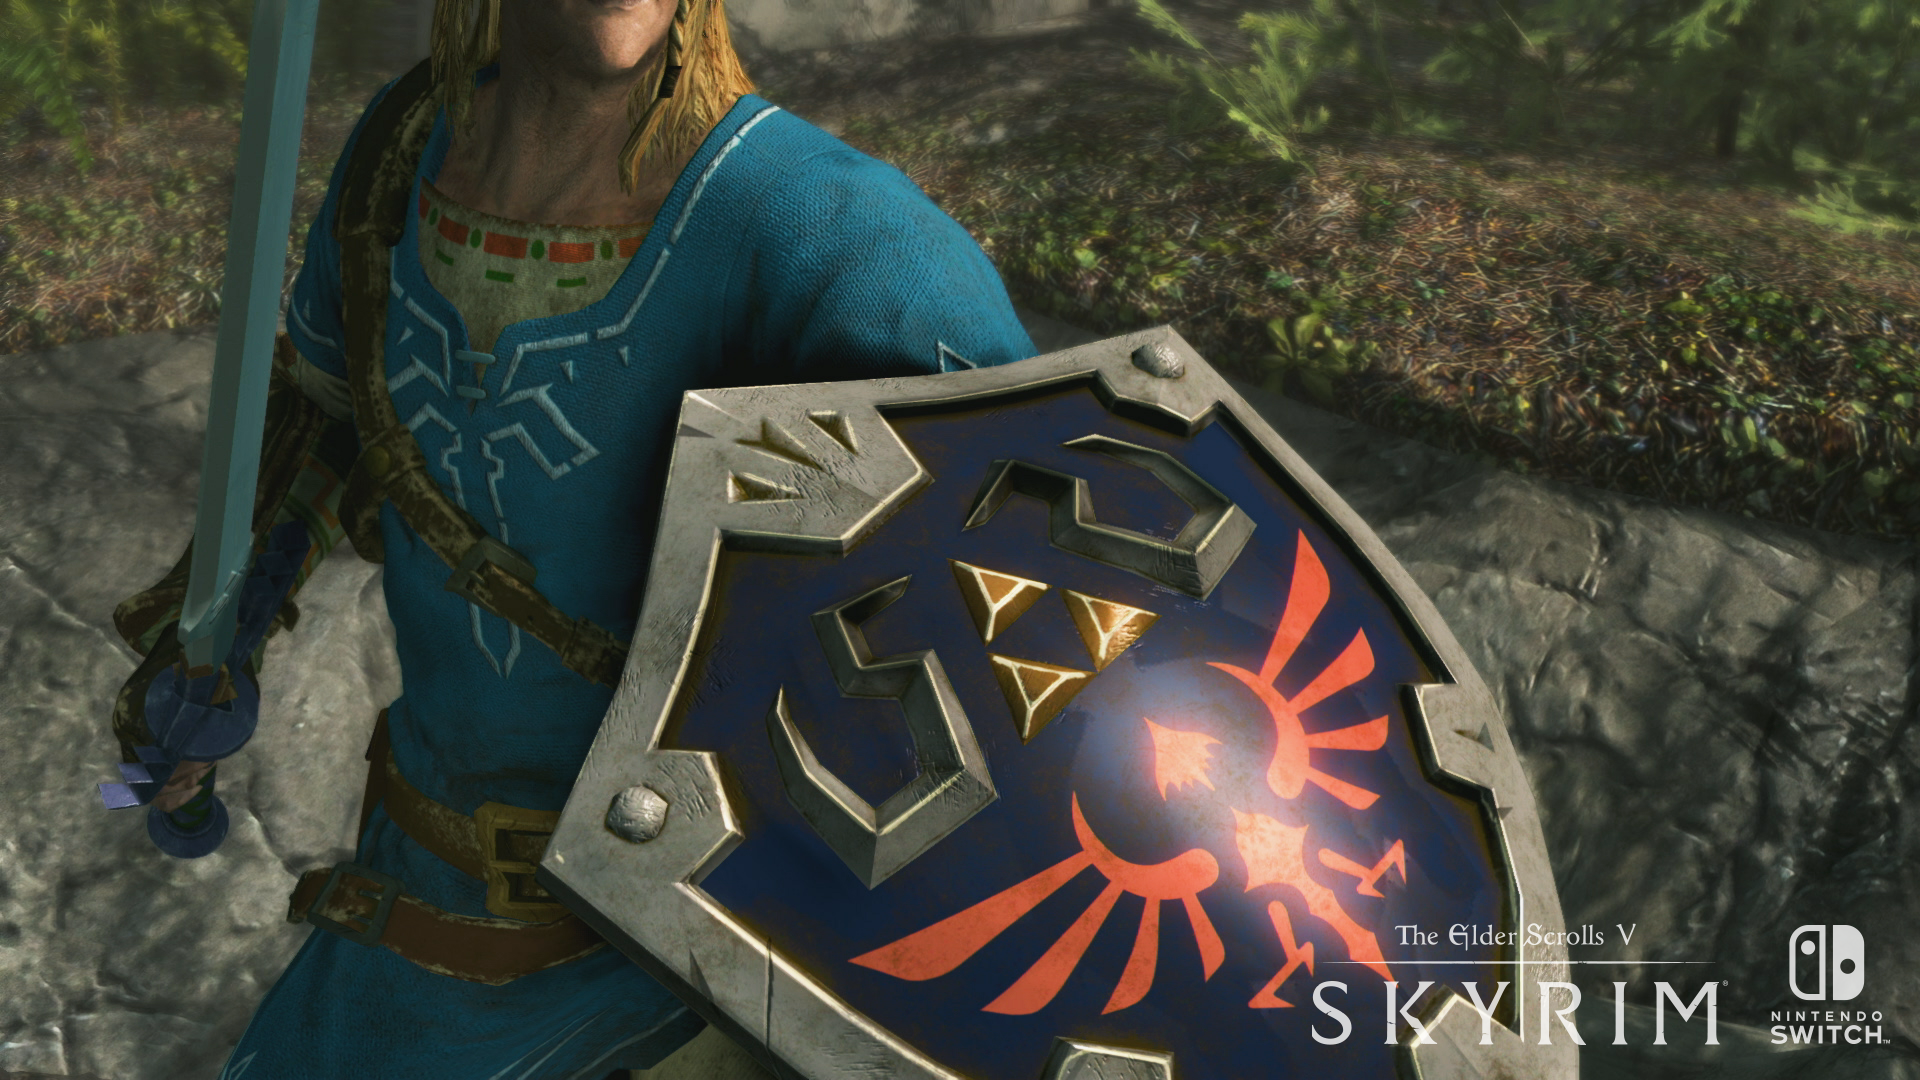 E3 2017 – Bethesda Land – The Elder Scrolls 5: Skyrim will come to the Nintendo Switch